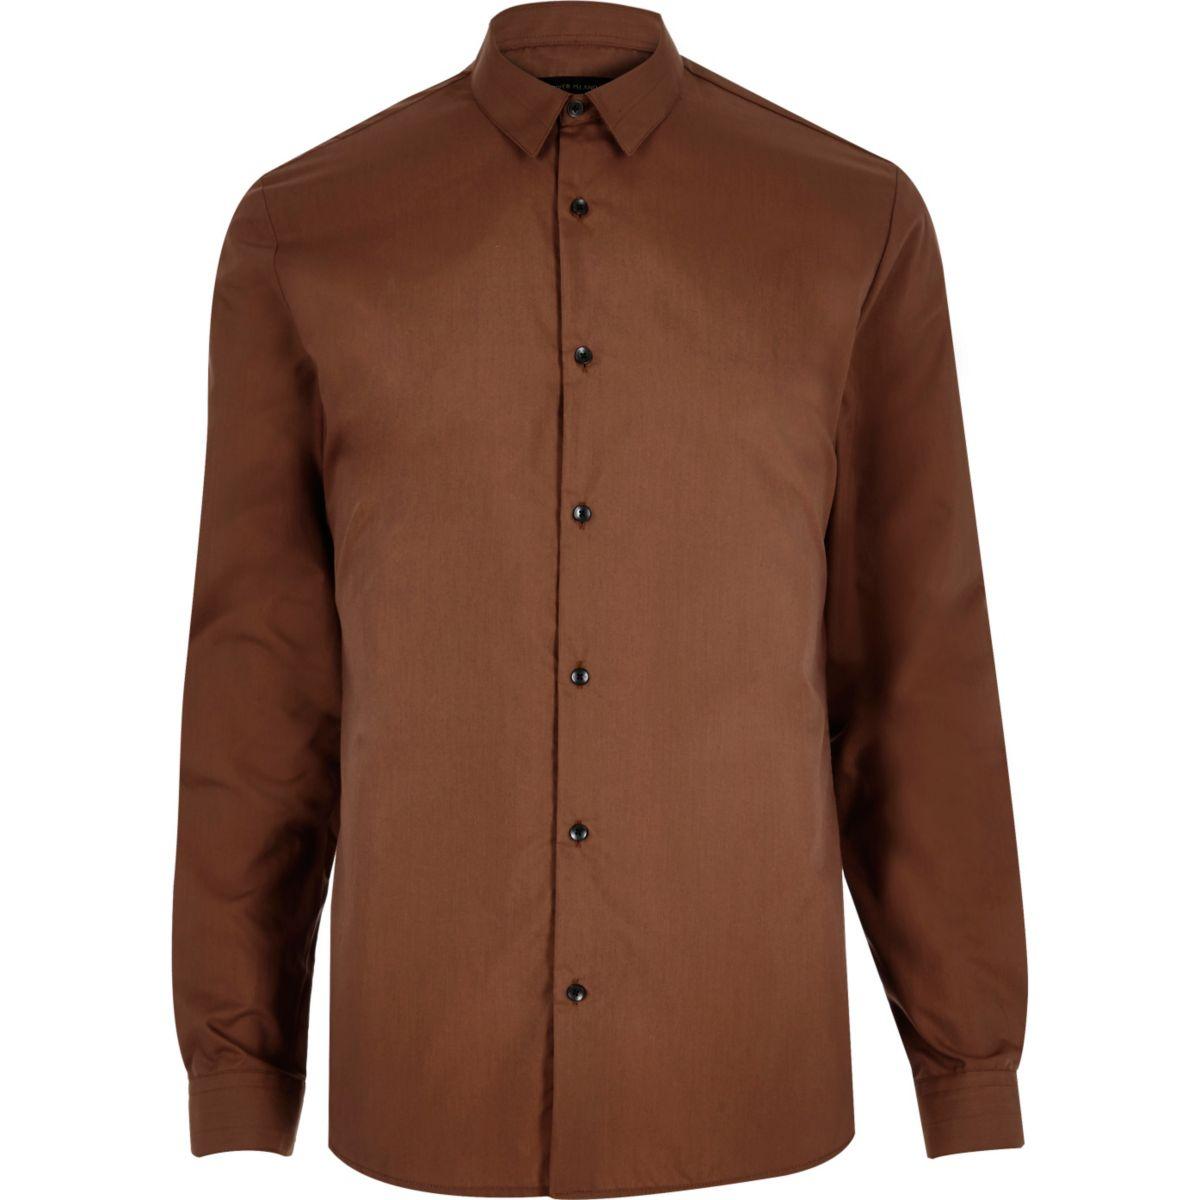 Rust brown stretch slim shirt